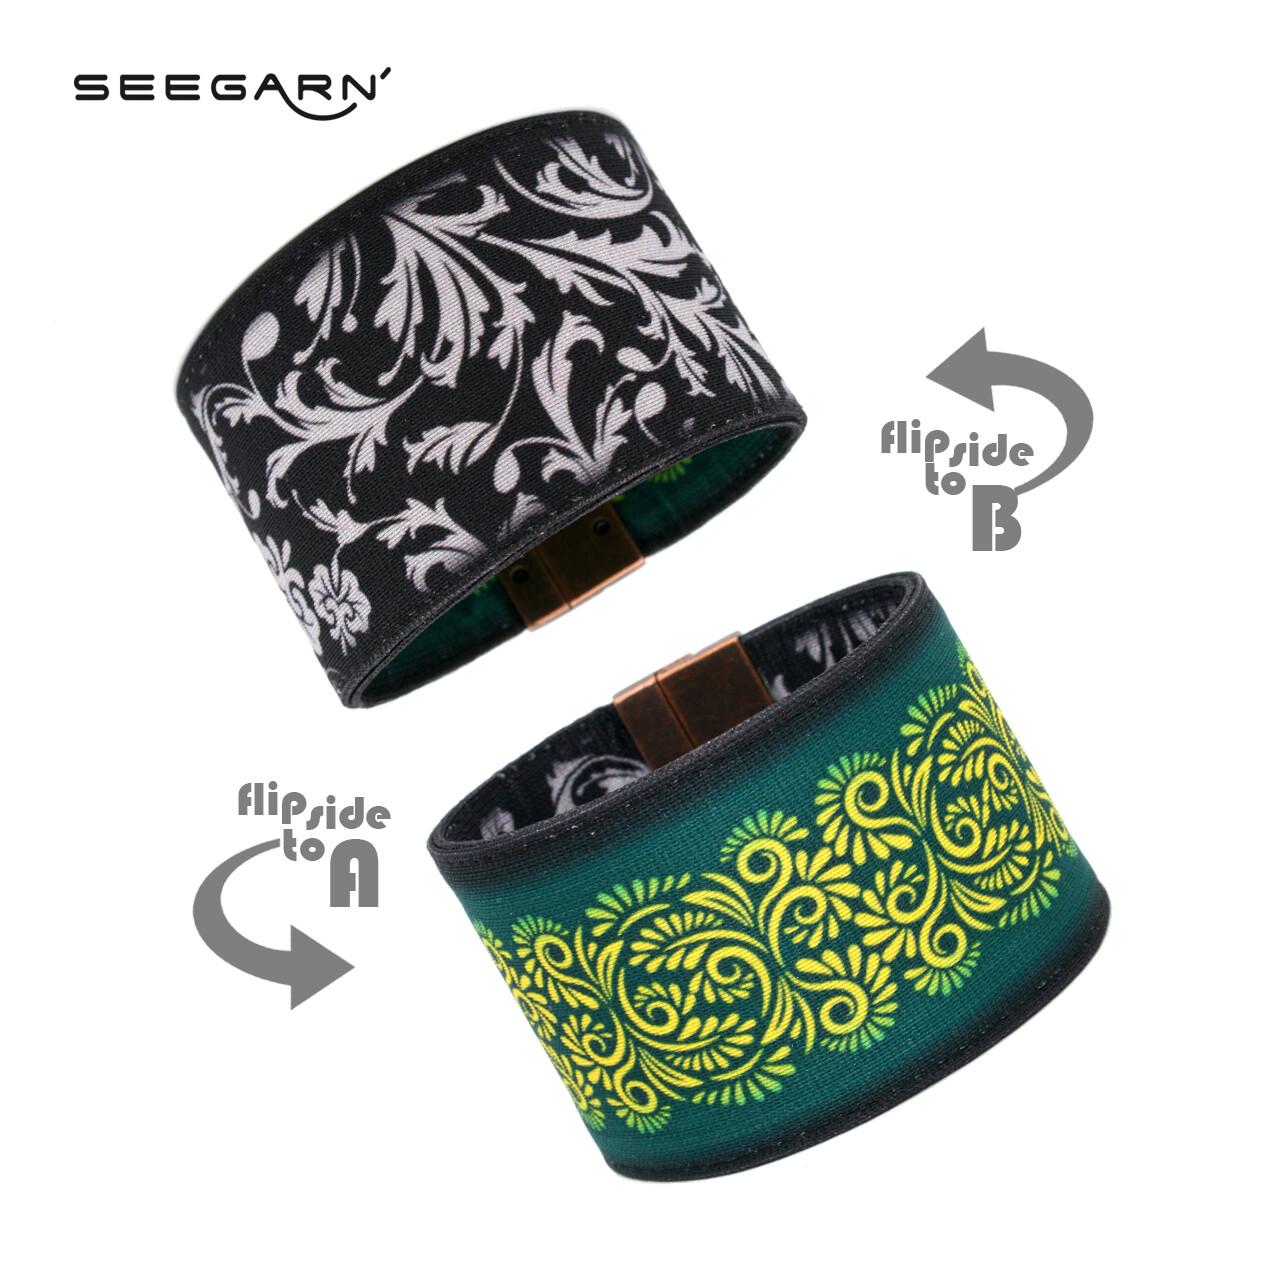 Seegarn Wende-Armband (Design MB23 & MB25)